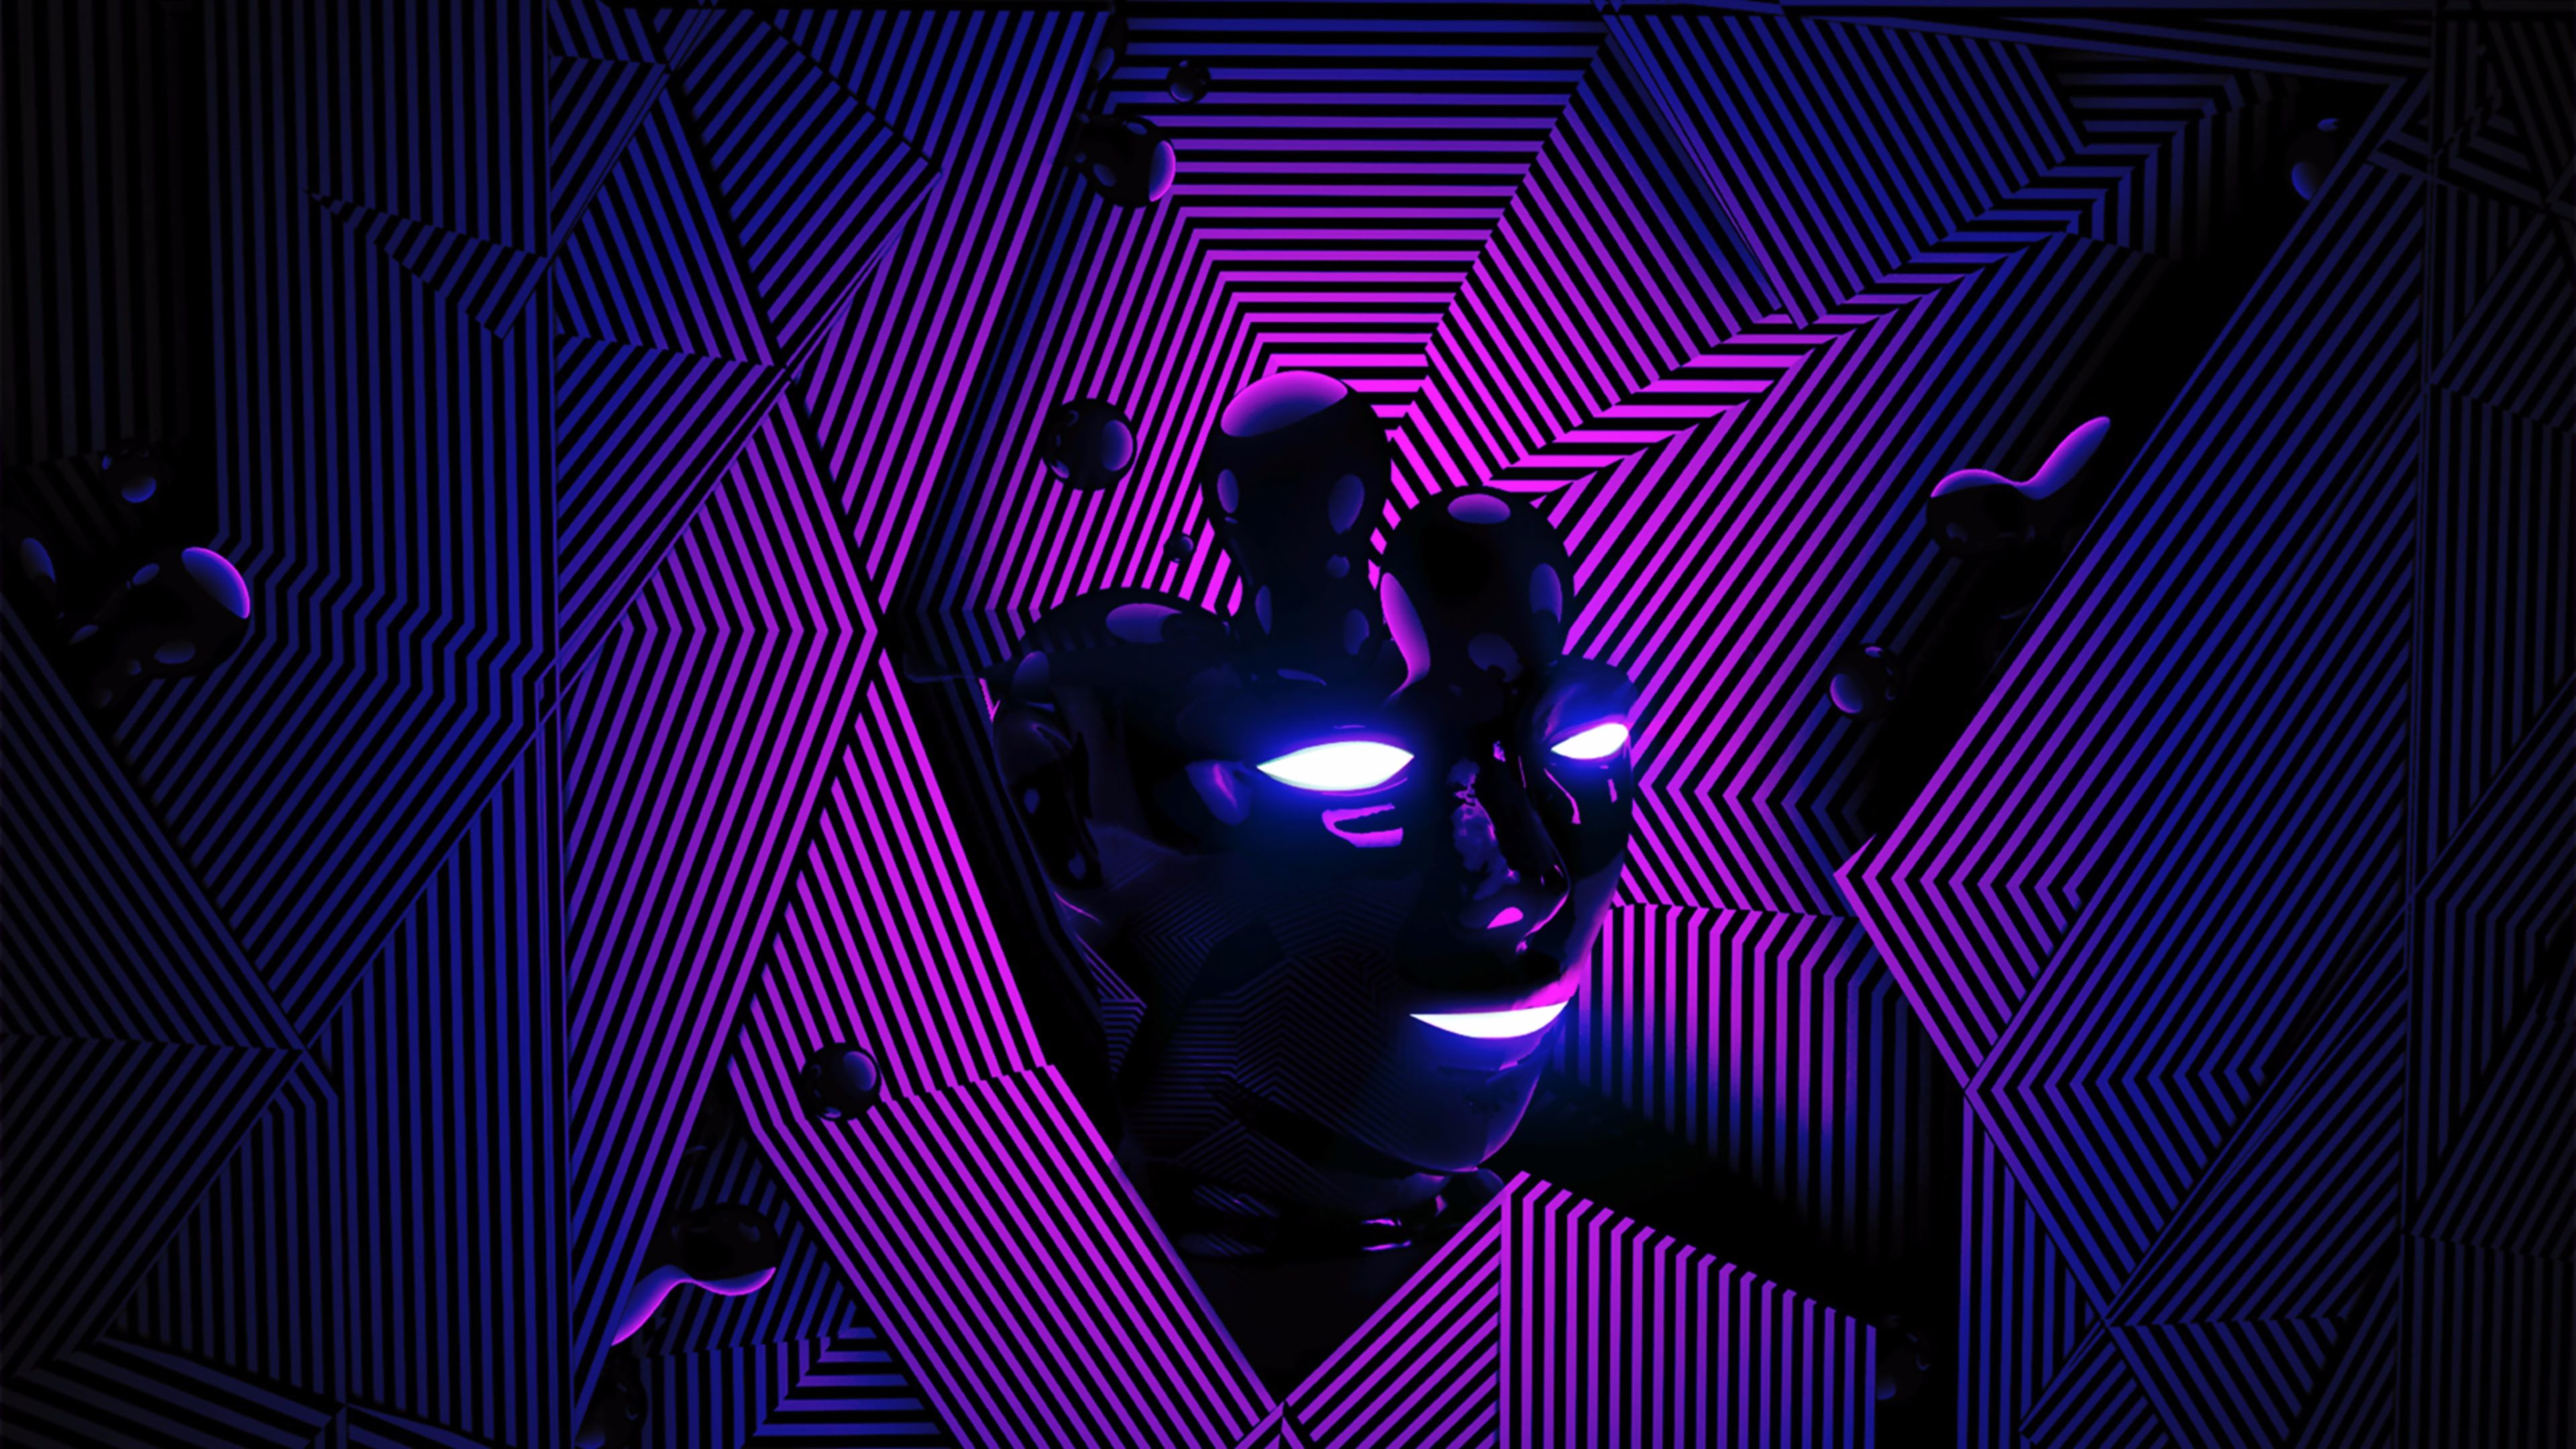 Res: 3840x2160, 4K Purple wallpapers